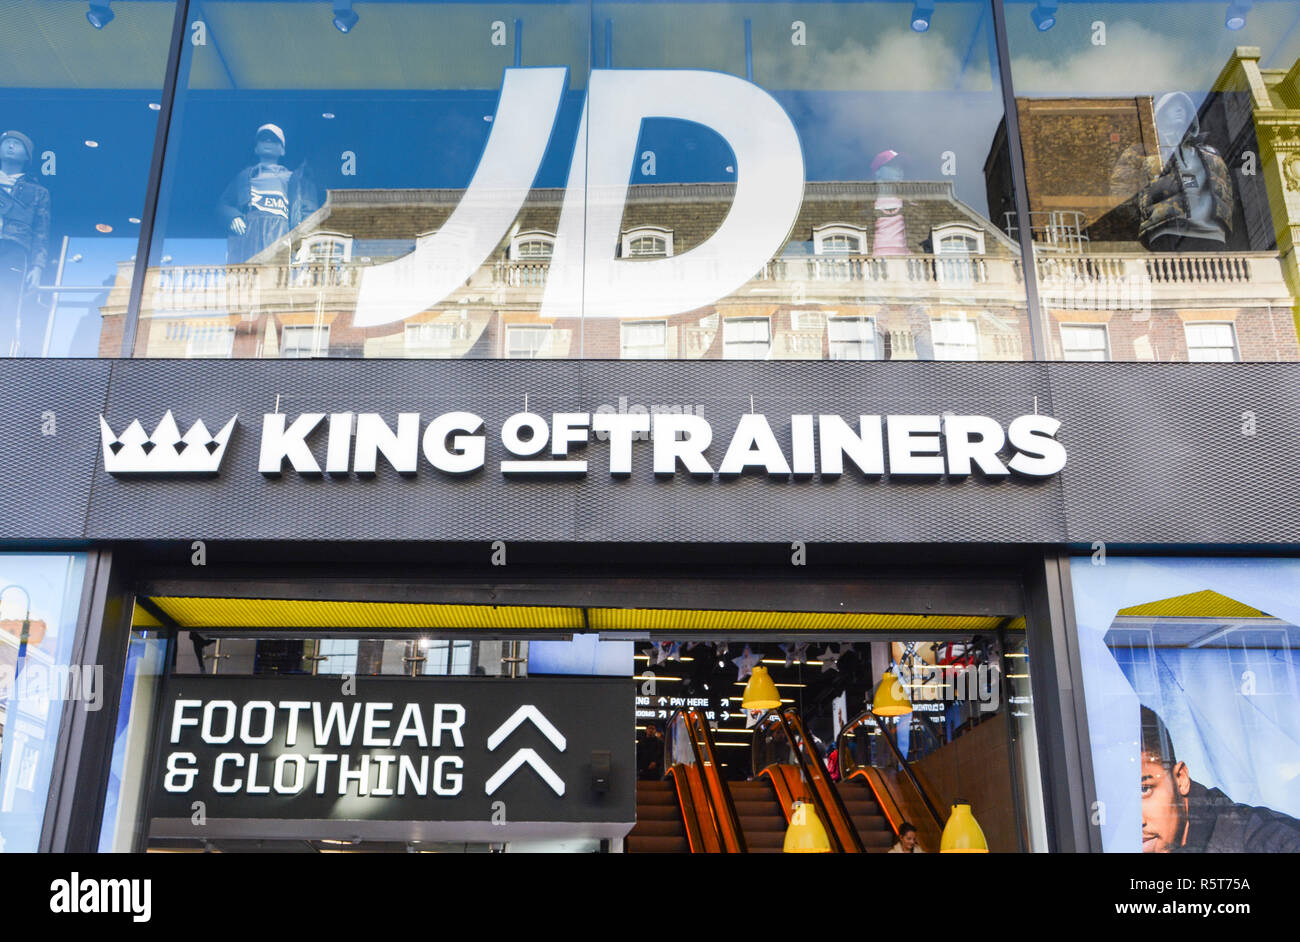 22e62813b539d Jd Sports Store Uk Stock Photos & Jd Sports Store Uk Stock Images ...